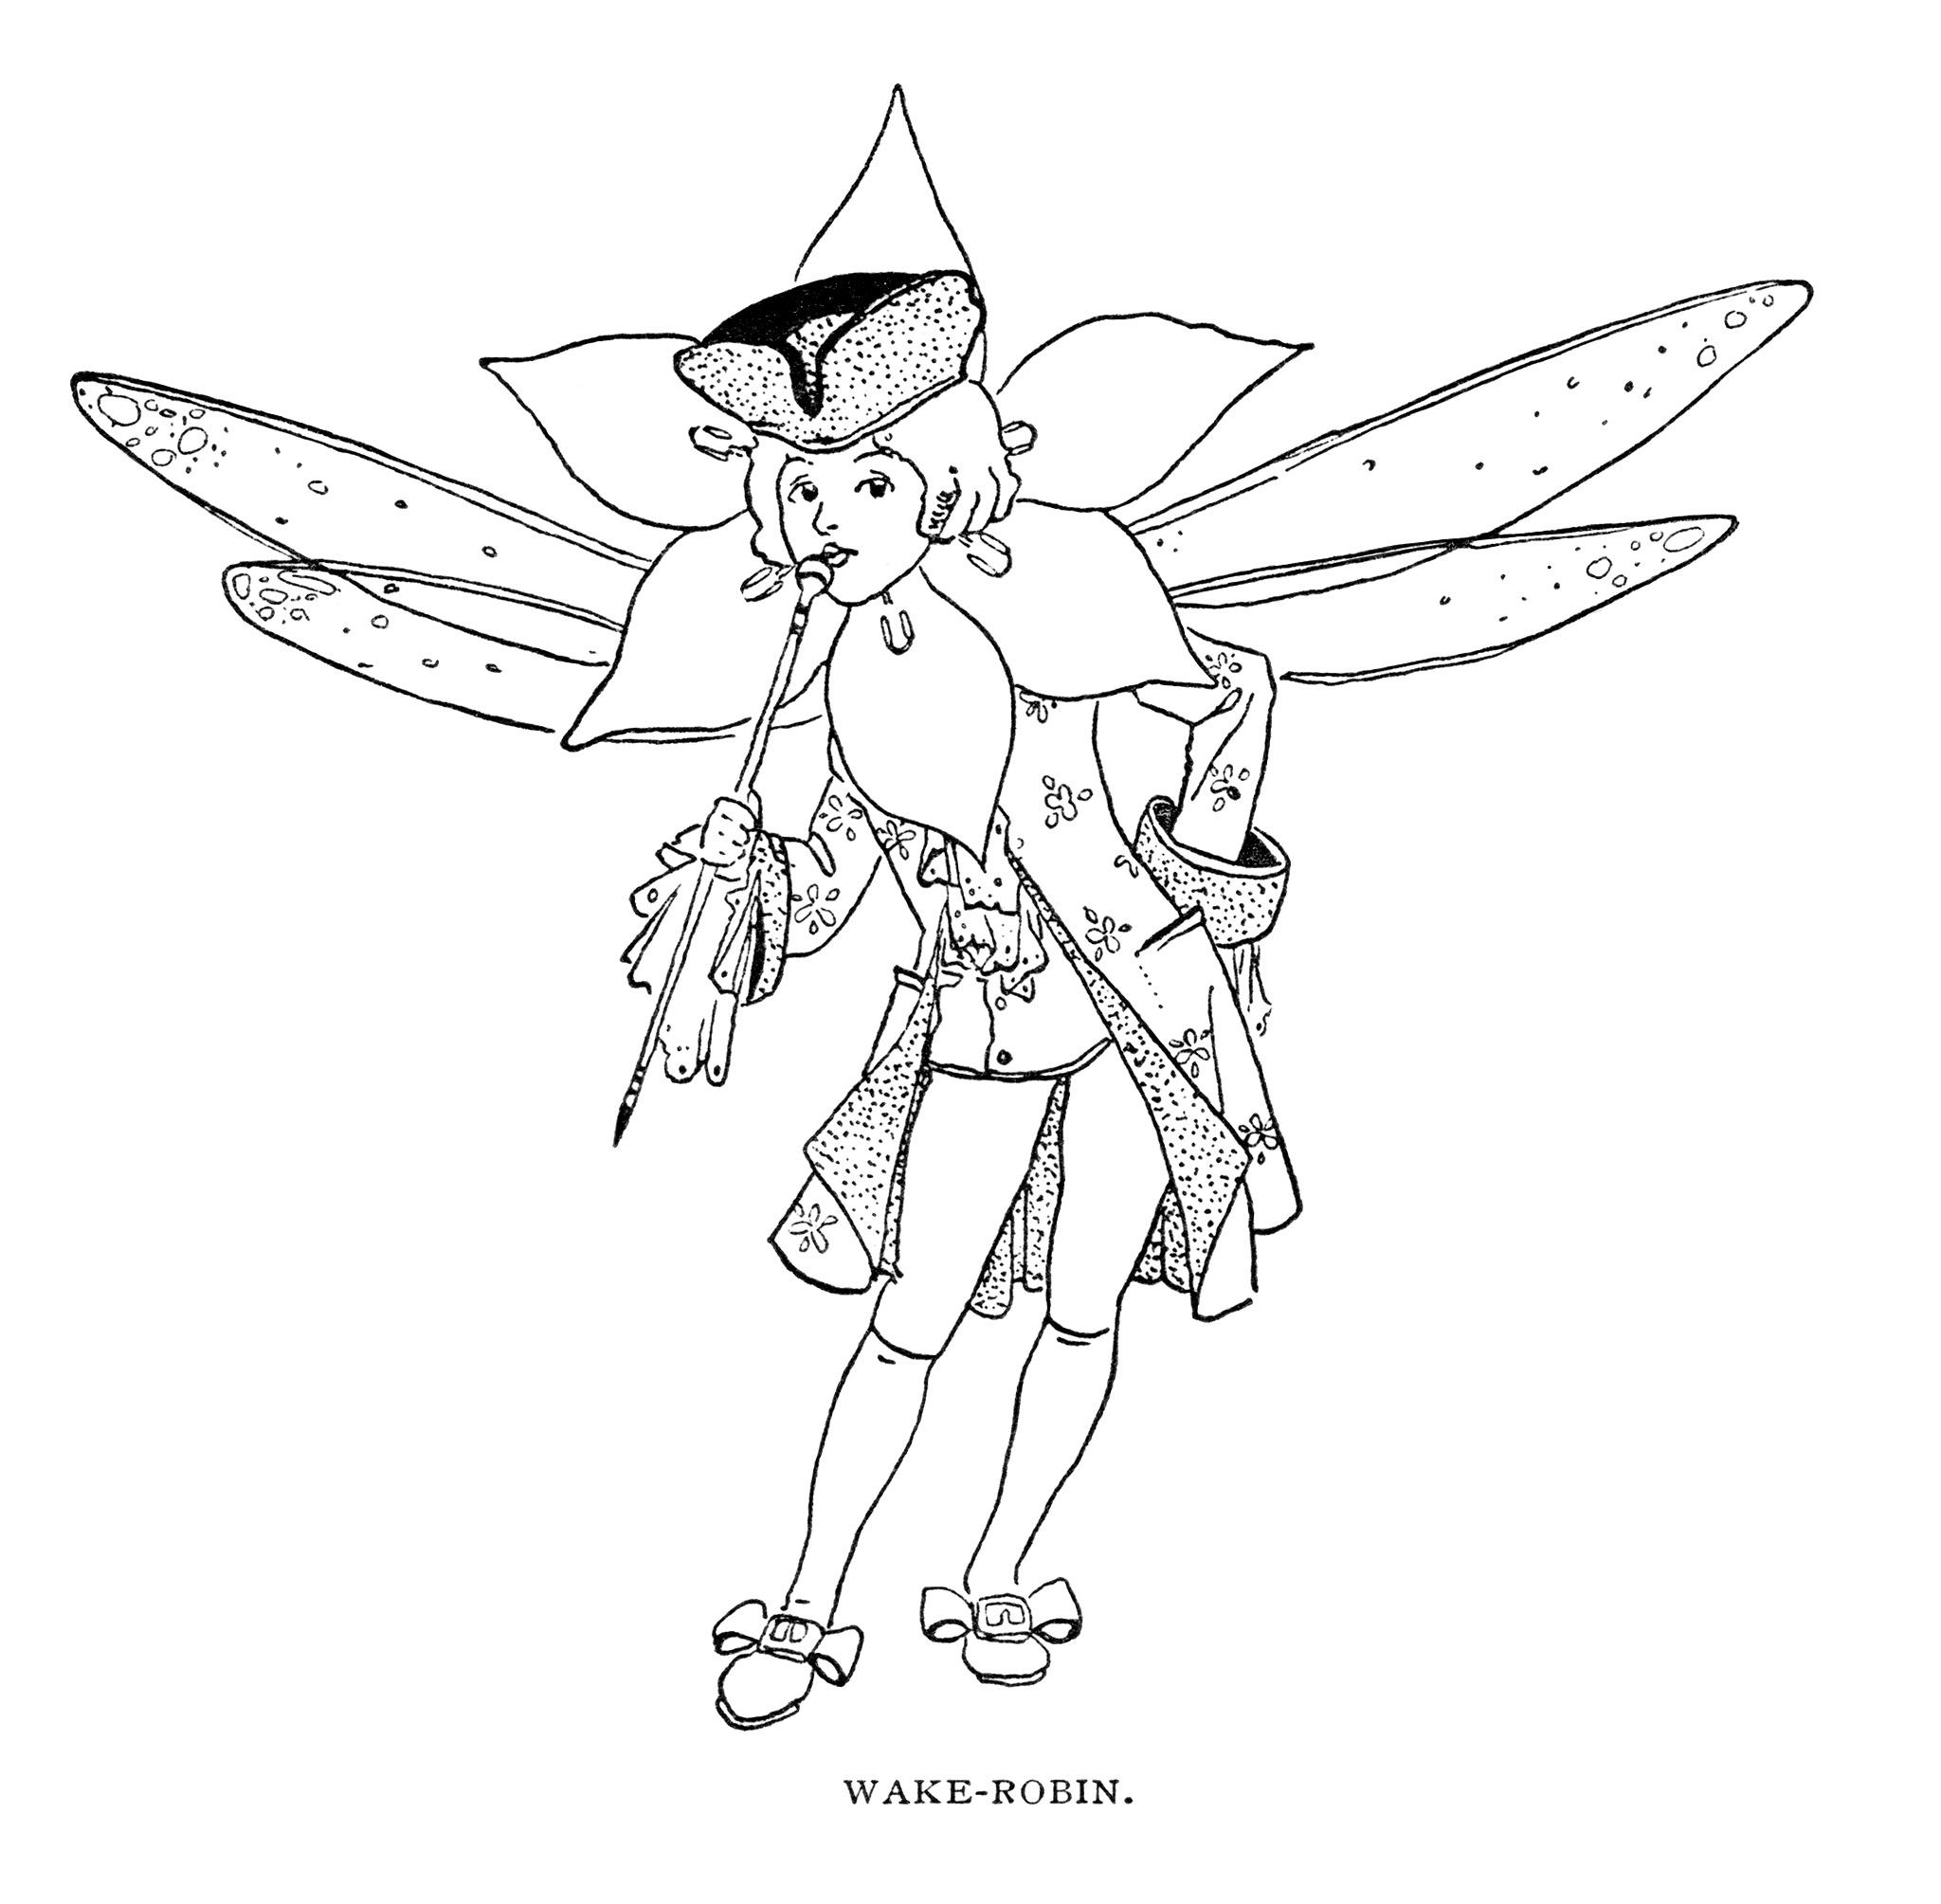 Free Vintage Image Wake Robin Storybook Character